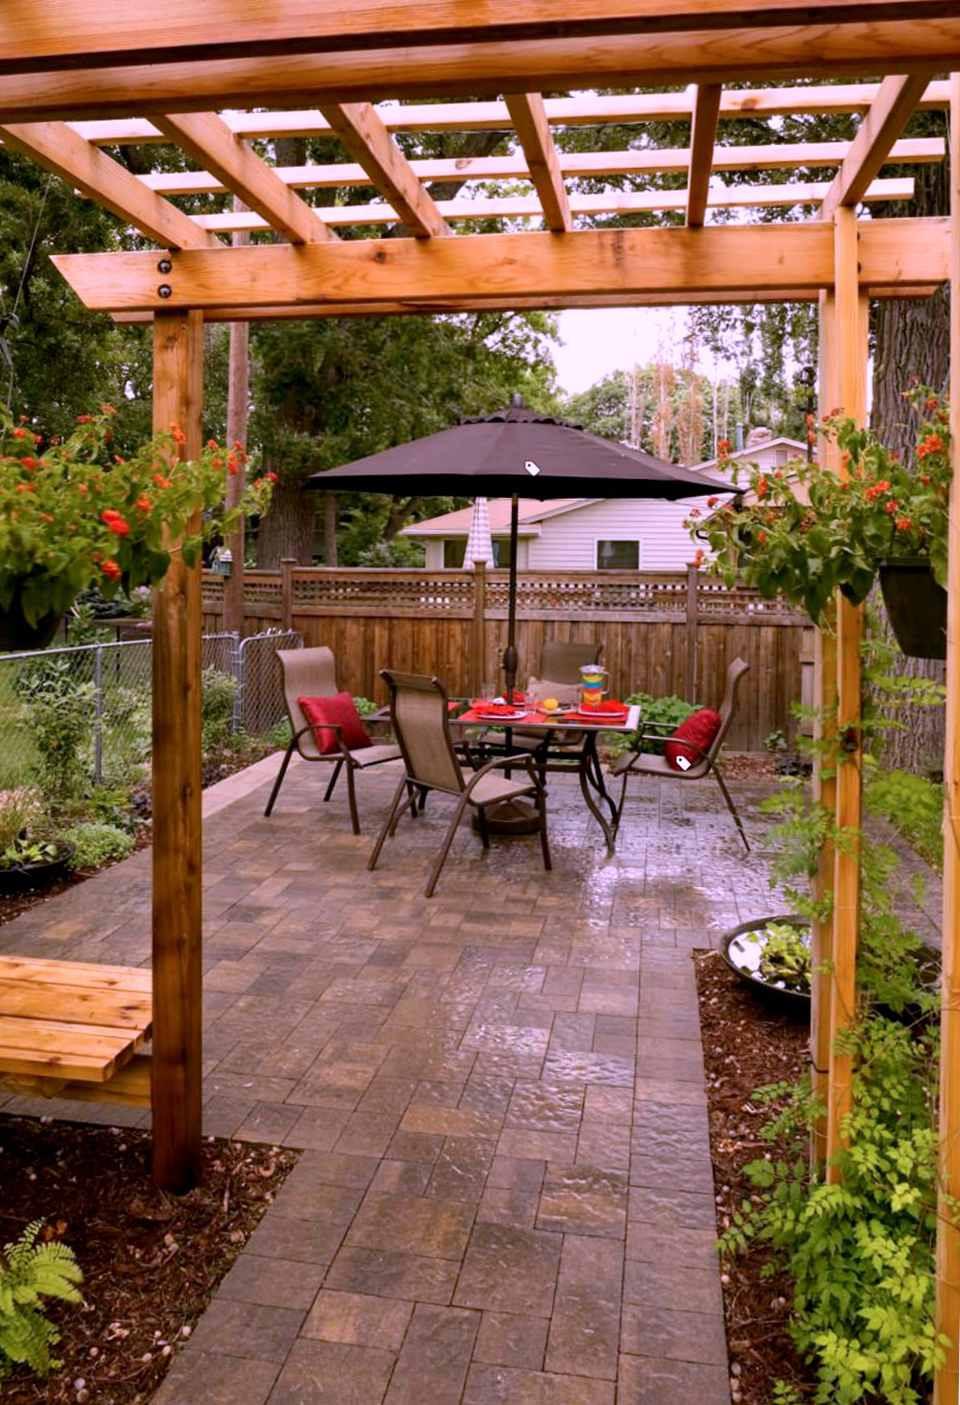 Backyard Patio Paver Design Ideas  25 Perfect Patio Paver Design Ideas